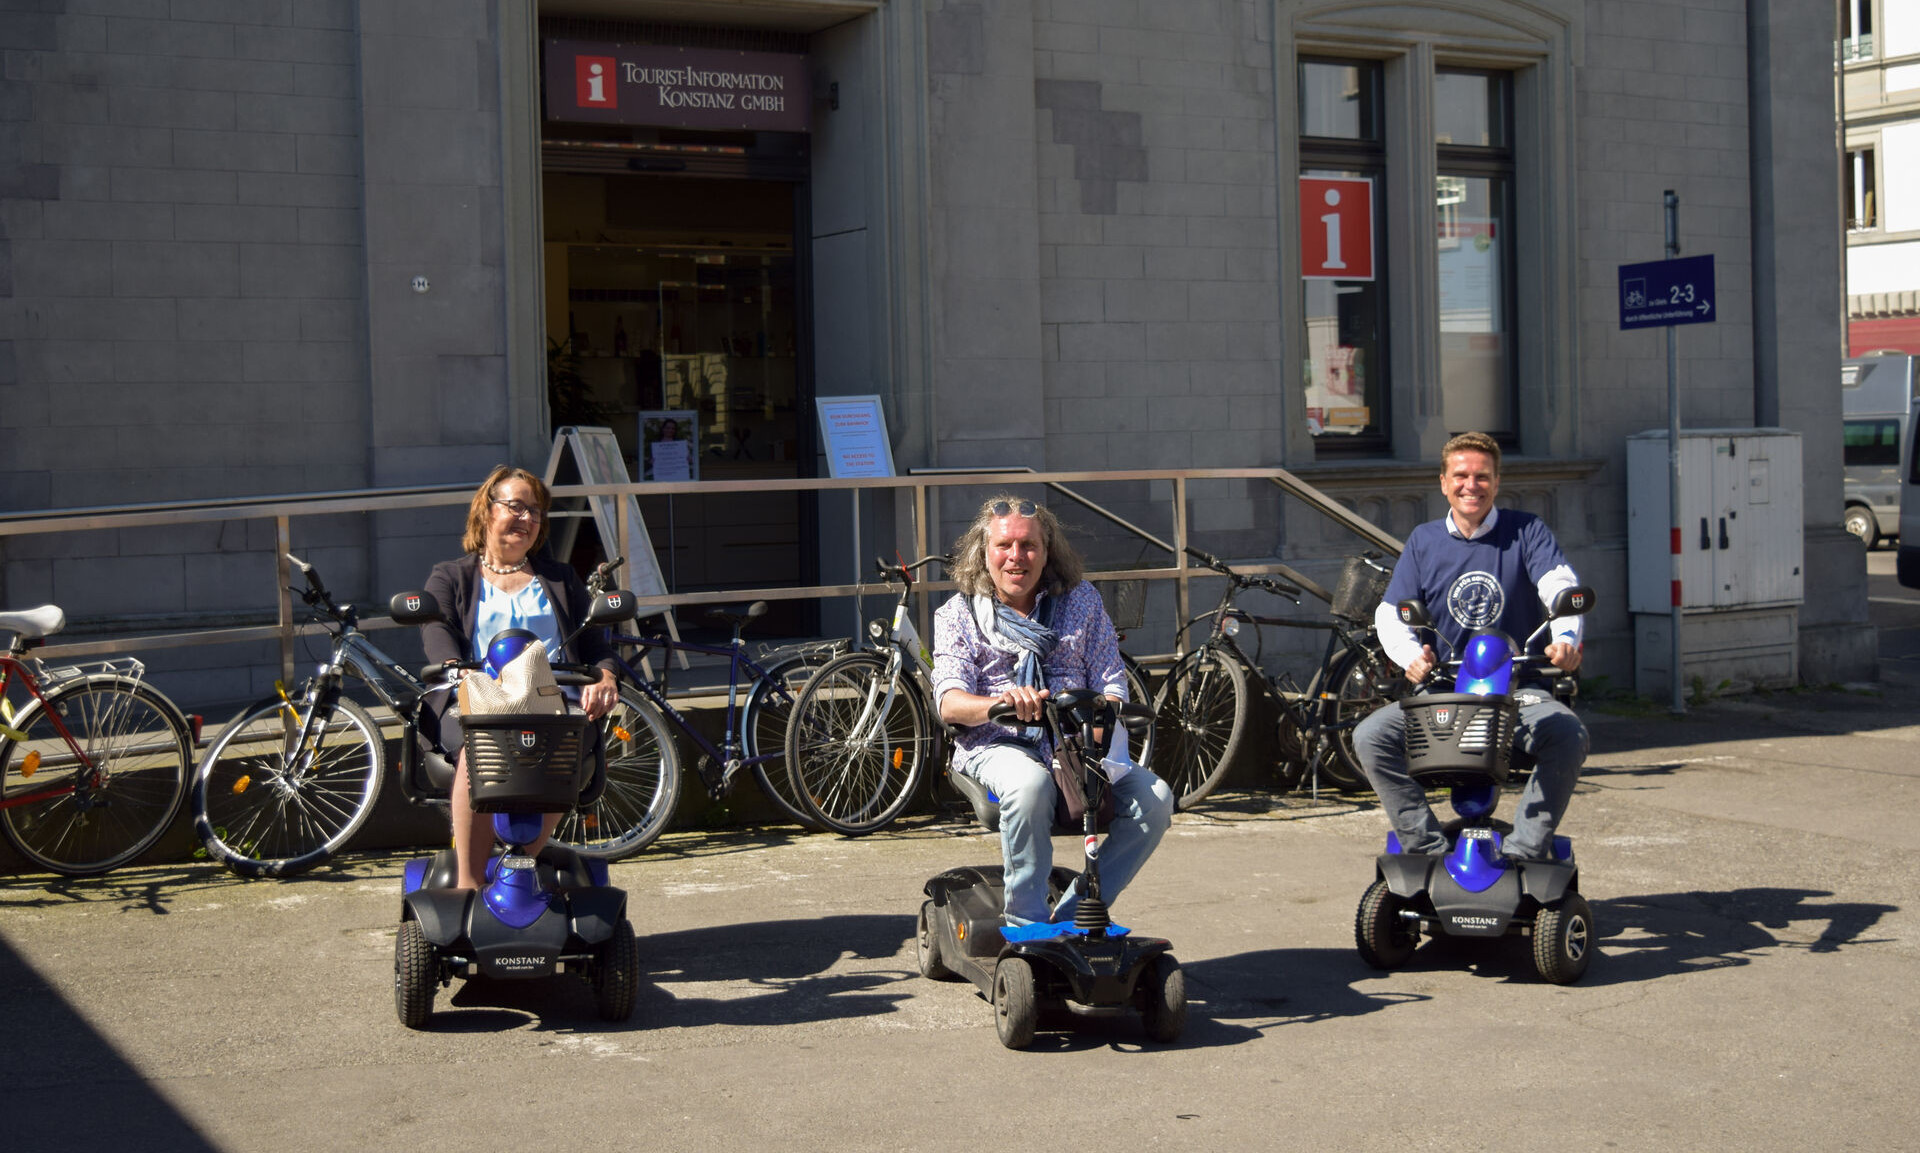 Konstanz-E-Scooter-Elektro-Mobile-TI-01_Copyright_MTK-Marion-Baumeister